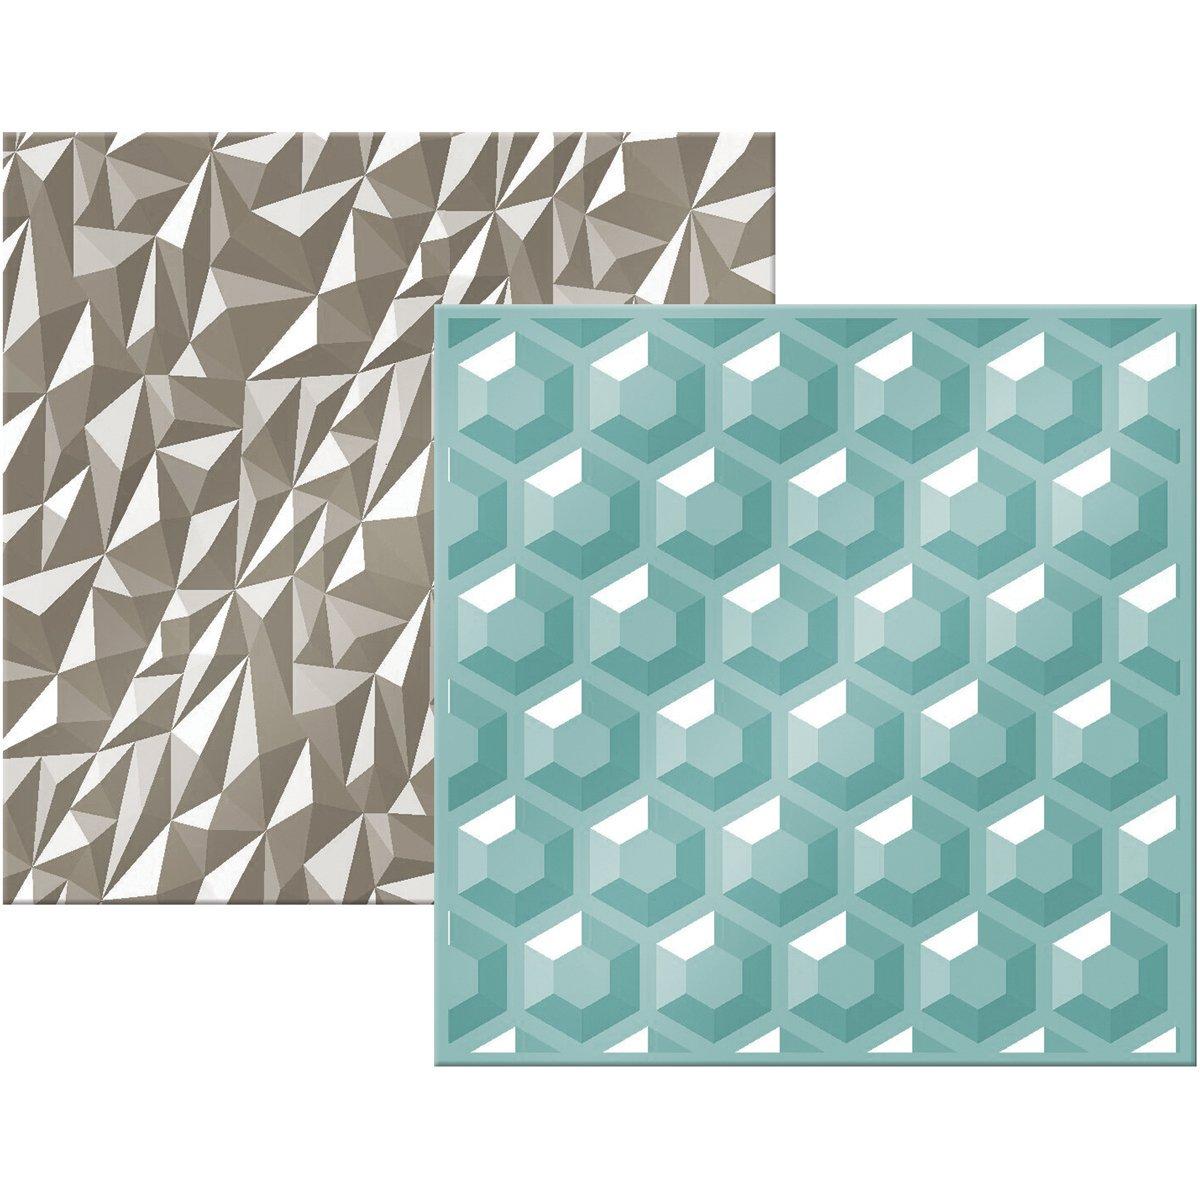 American Crafts Next Level Embossing Folders by We R Memory Keepers-Gemstones